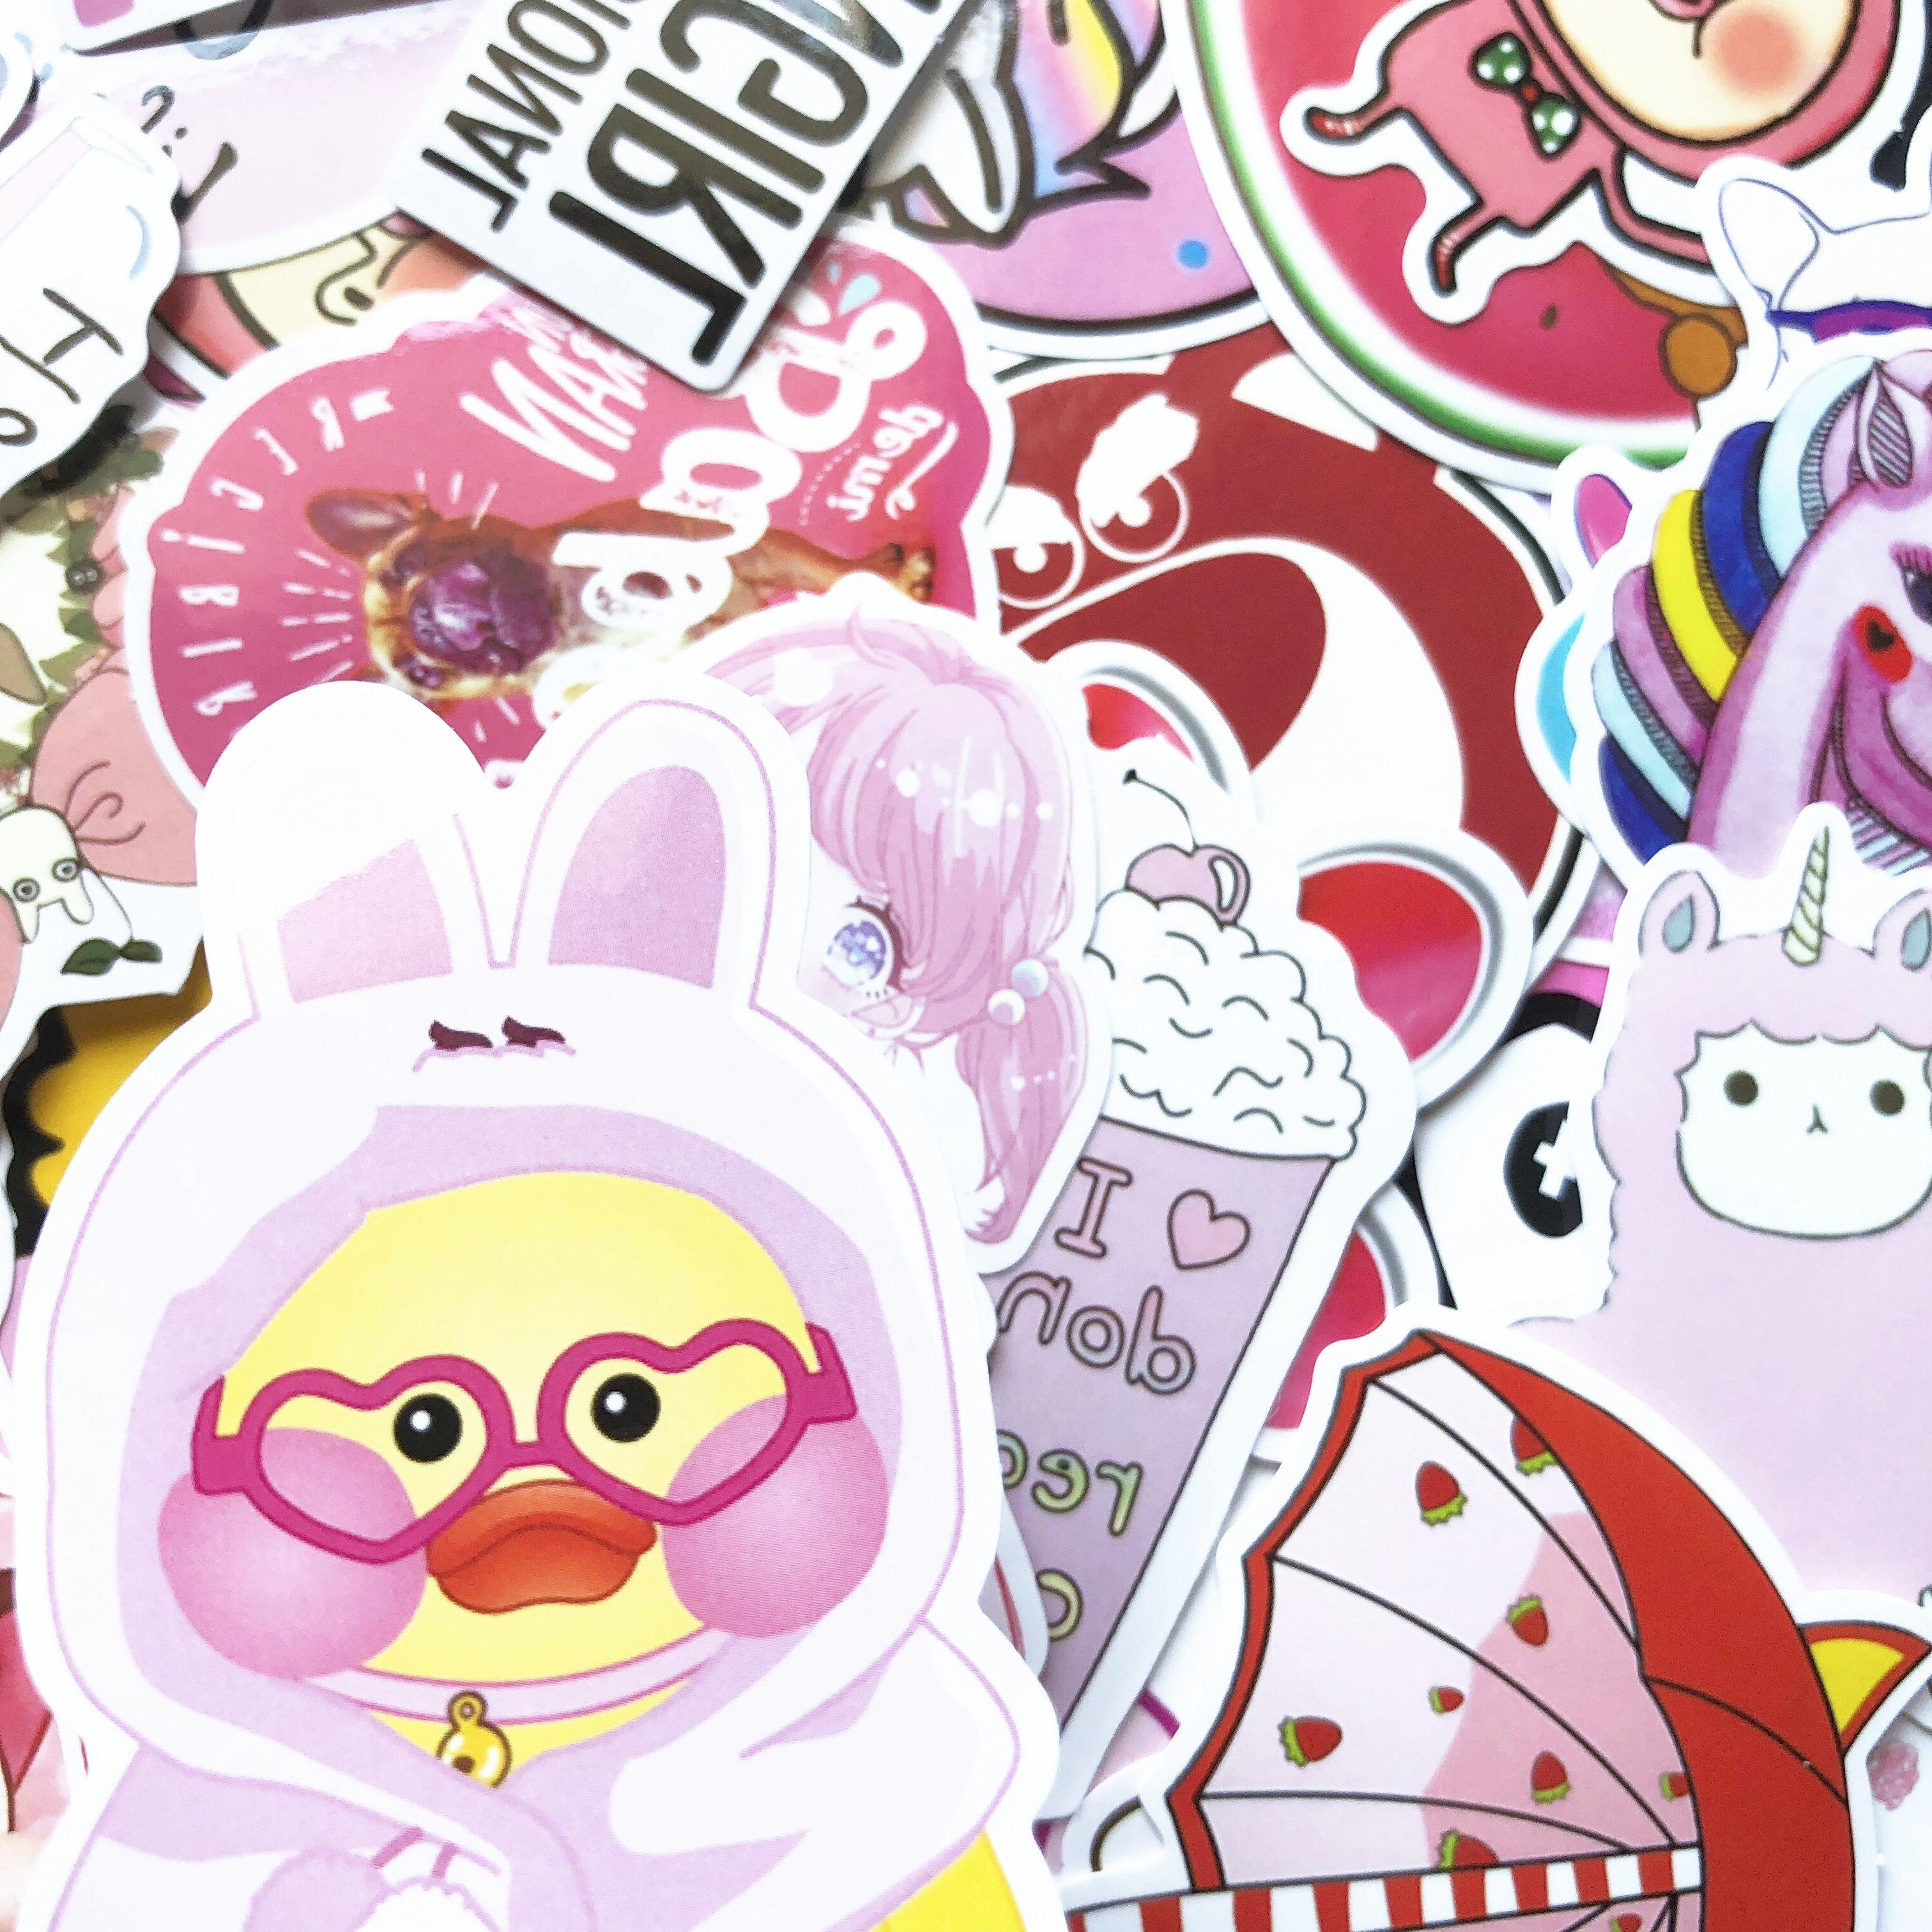 50 PVC <font><b>Pink</b></font> Toys The Luggage For Moto Car Suitcase Fashion <font><b>Laptop</b></font> <font><b>stickers</b></font>